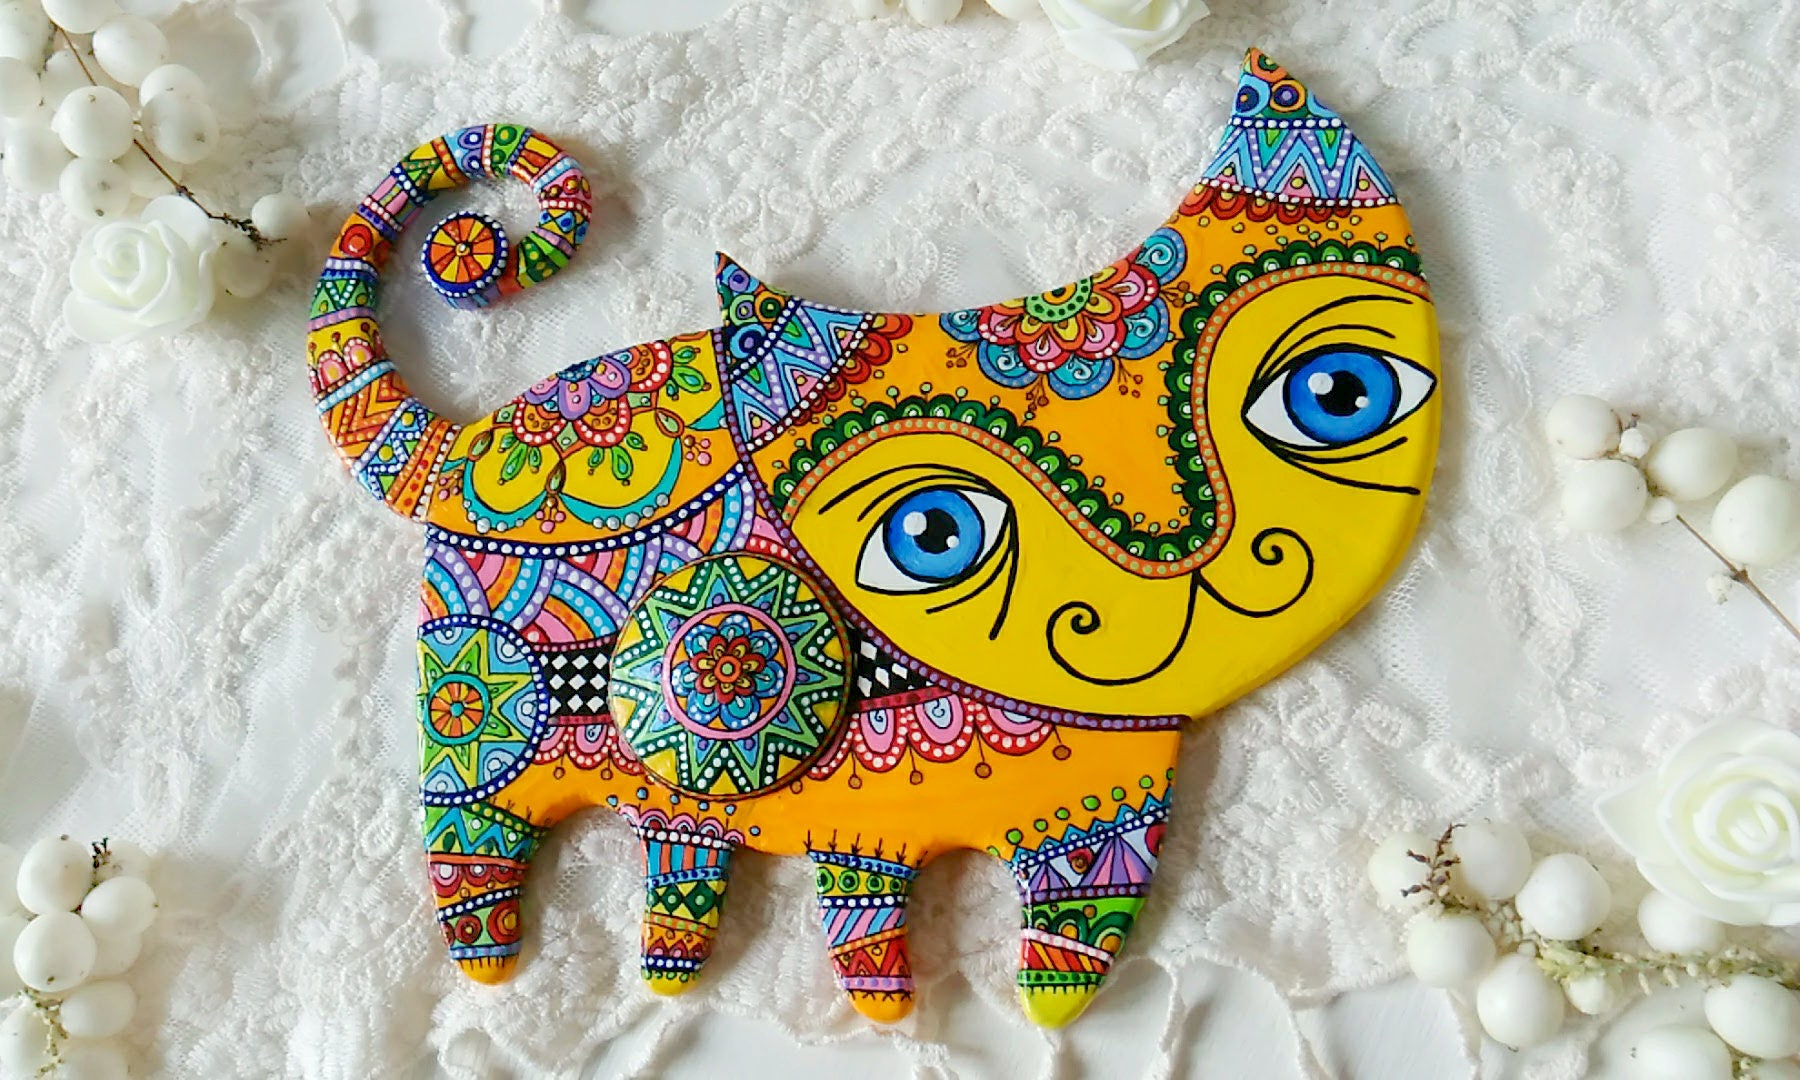 Cat artwork in Talavera pottery mexican folk art style. Bright | Etsy